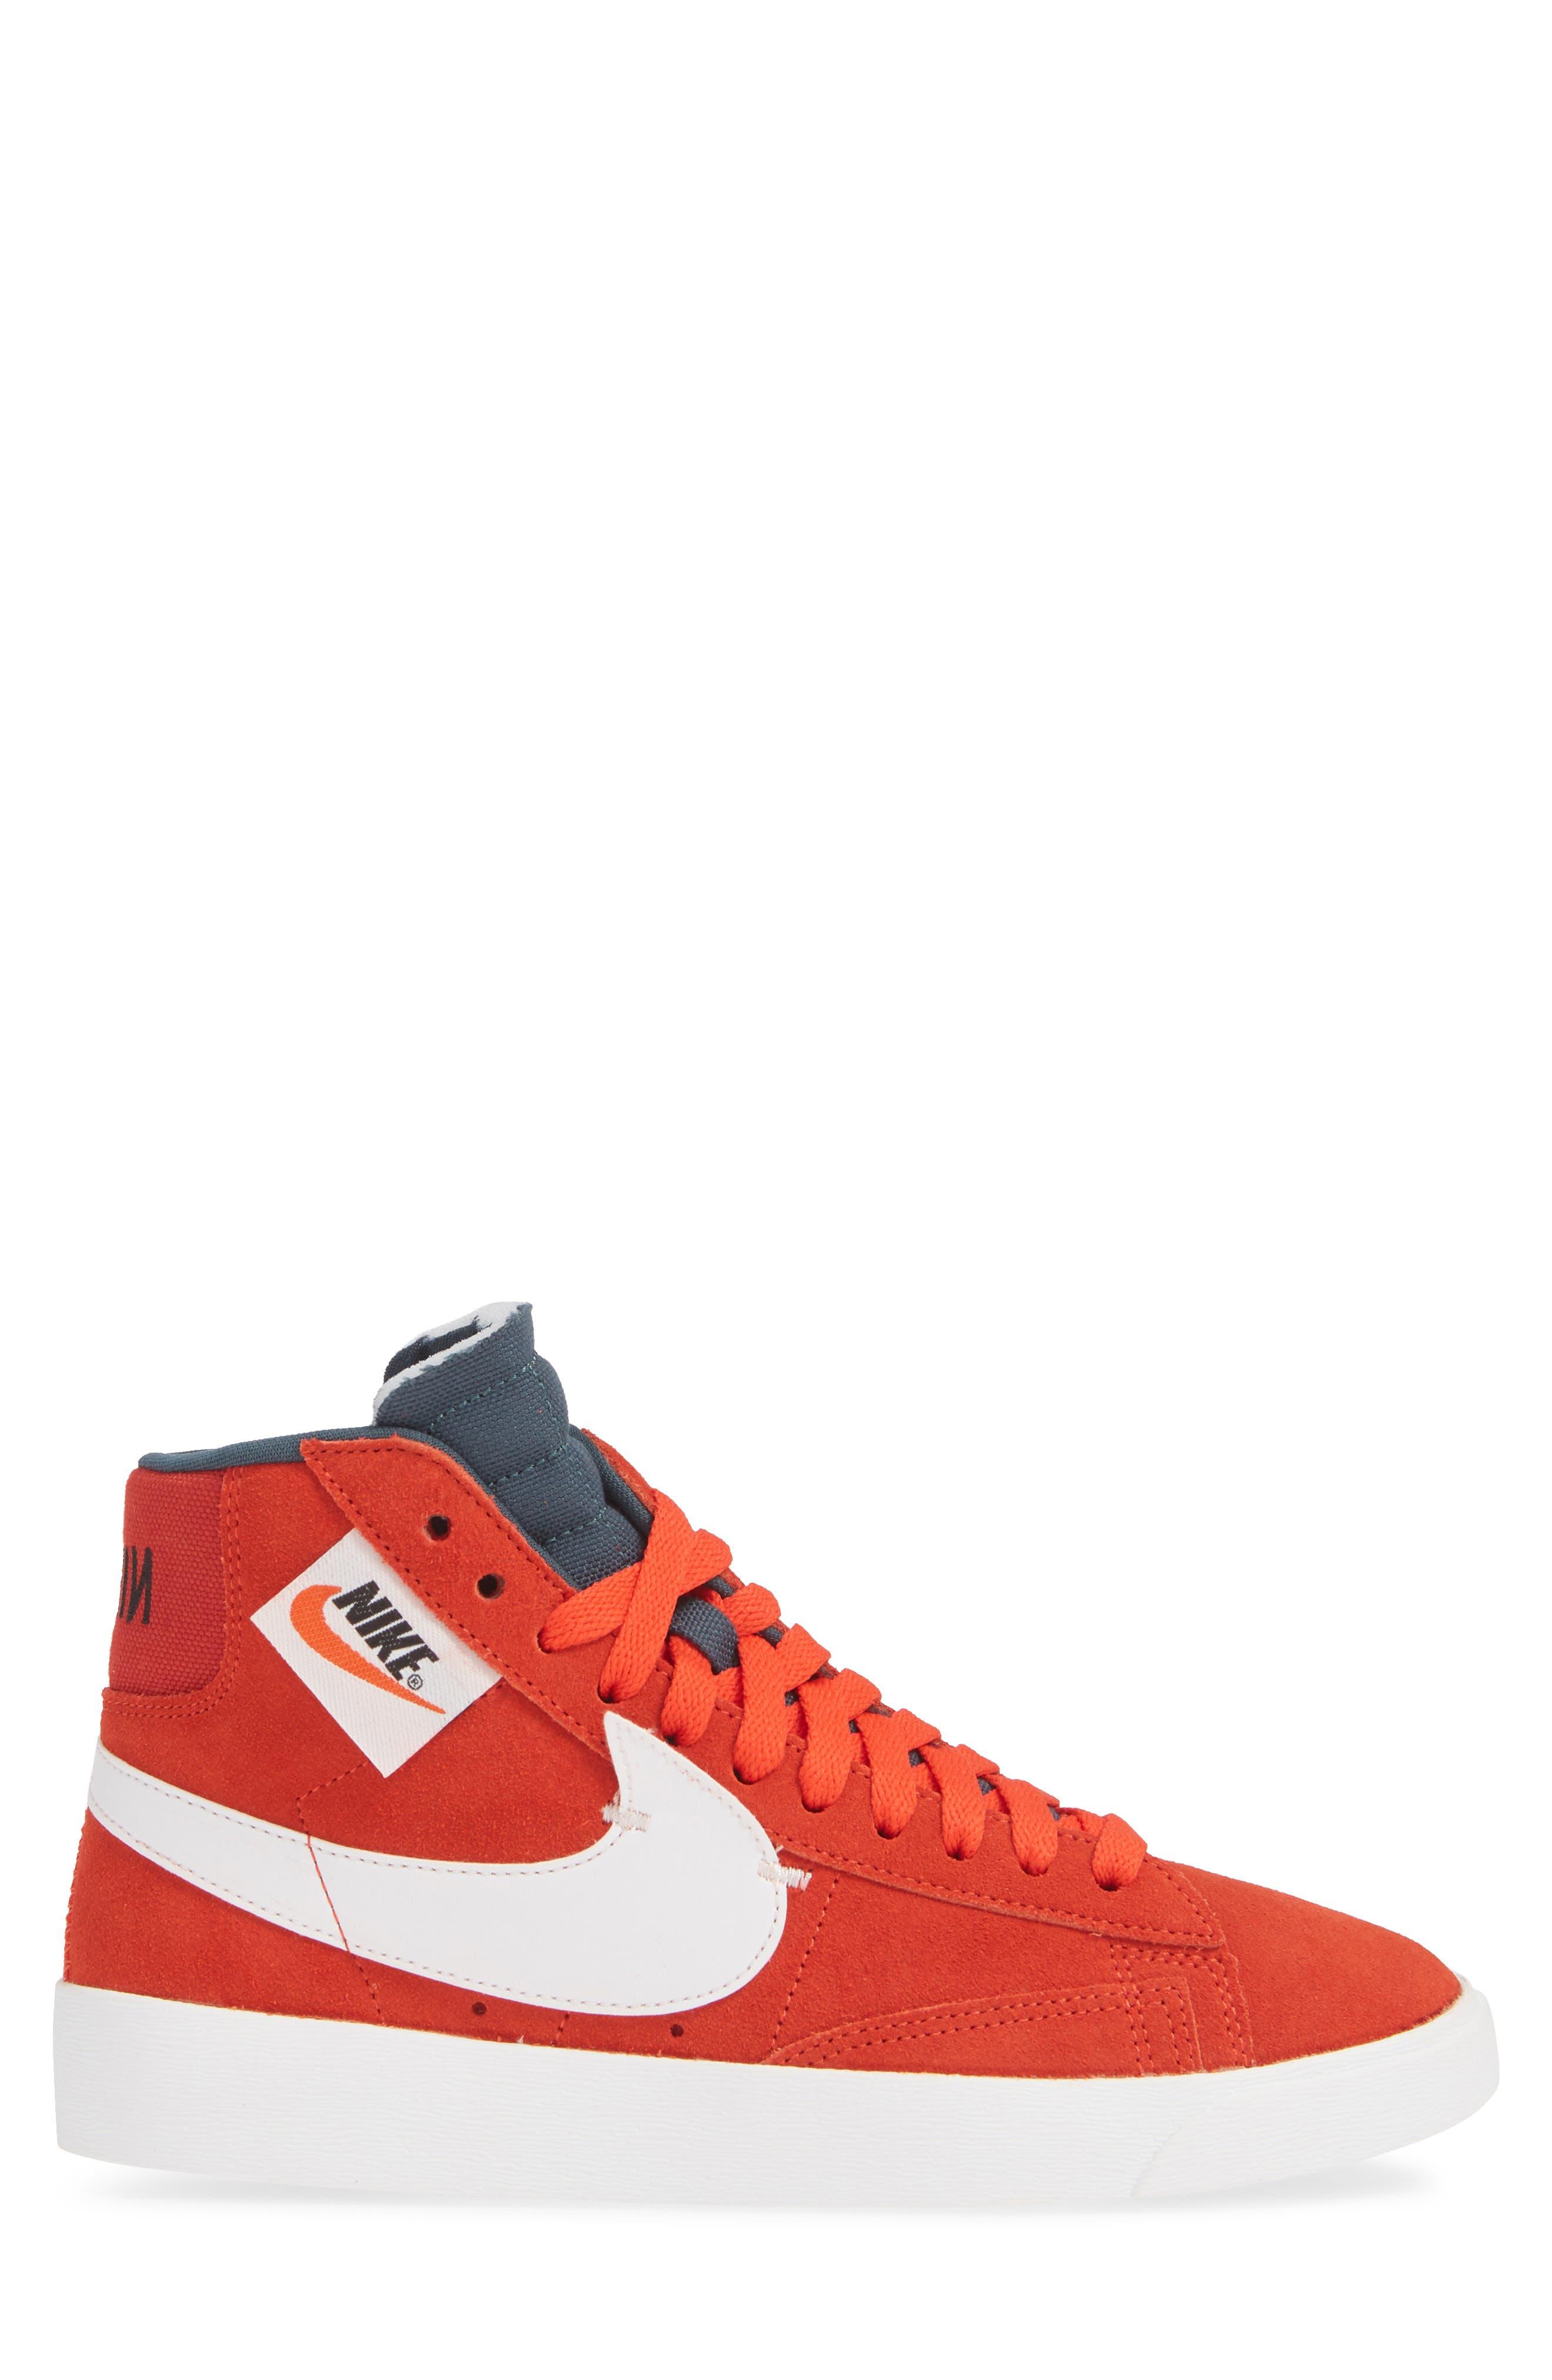 Blazer Mid Rebel Sneaker,                             Alternate thumbnail 3, color,                             HABANERO/ WHITE/ BLACK/ SPRUCE